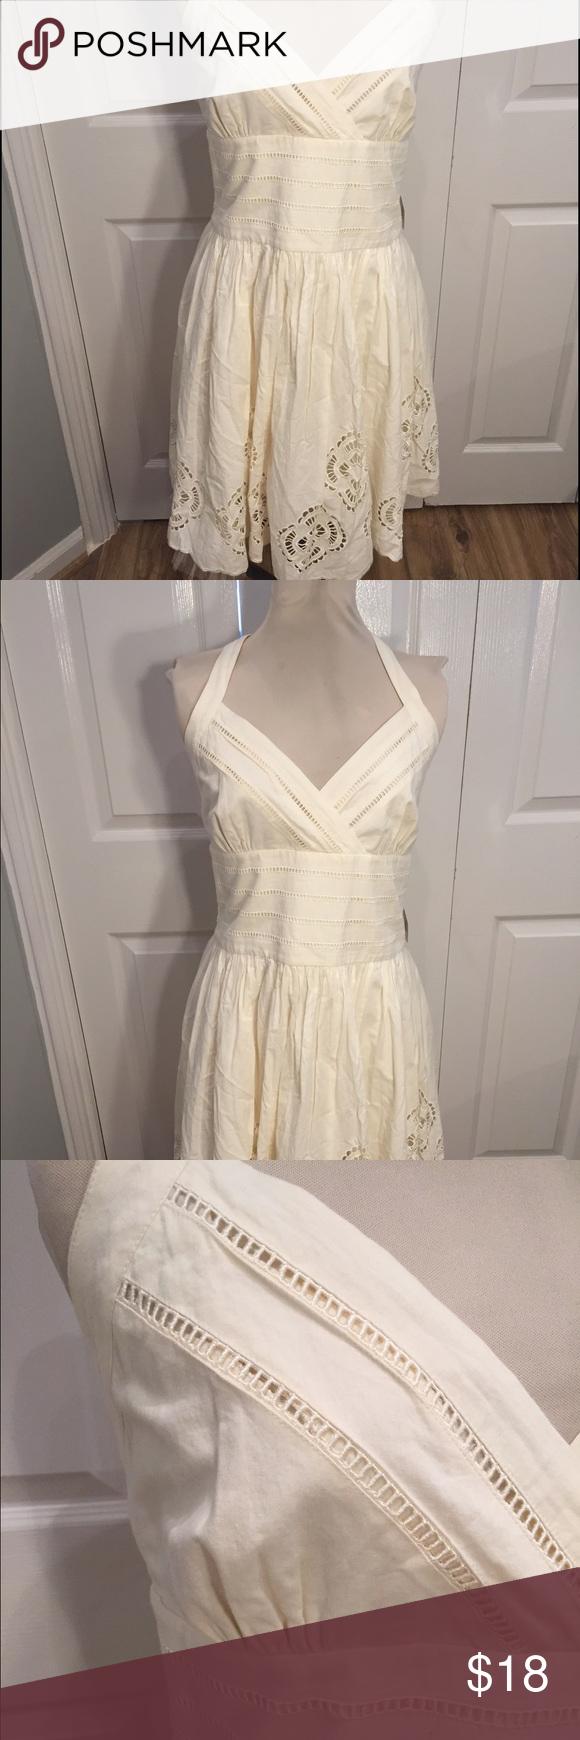 Jessica simpson wedding dress  NWT Jessica Simpson dress size  halter cream NWT  Jessica simpson